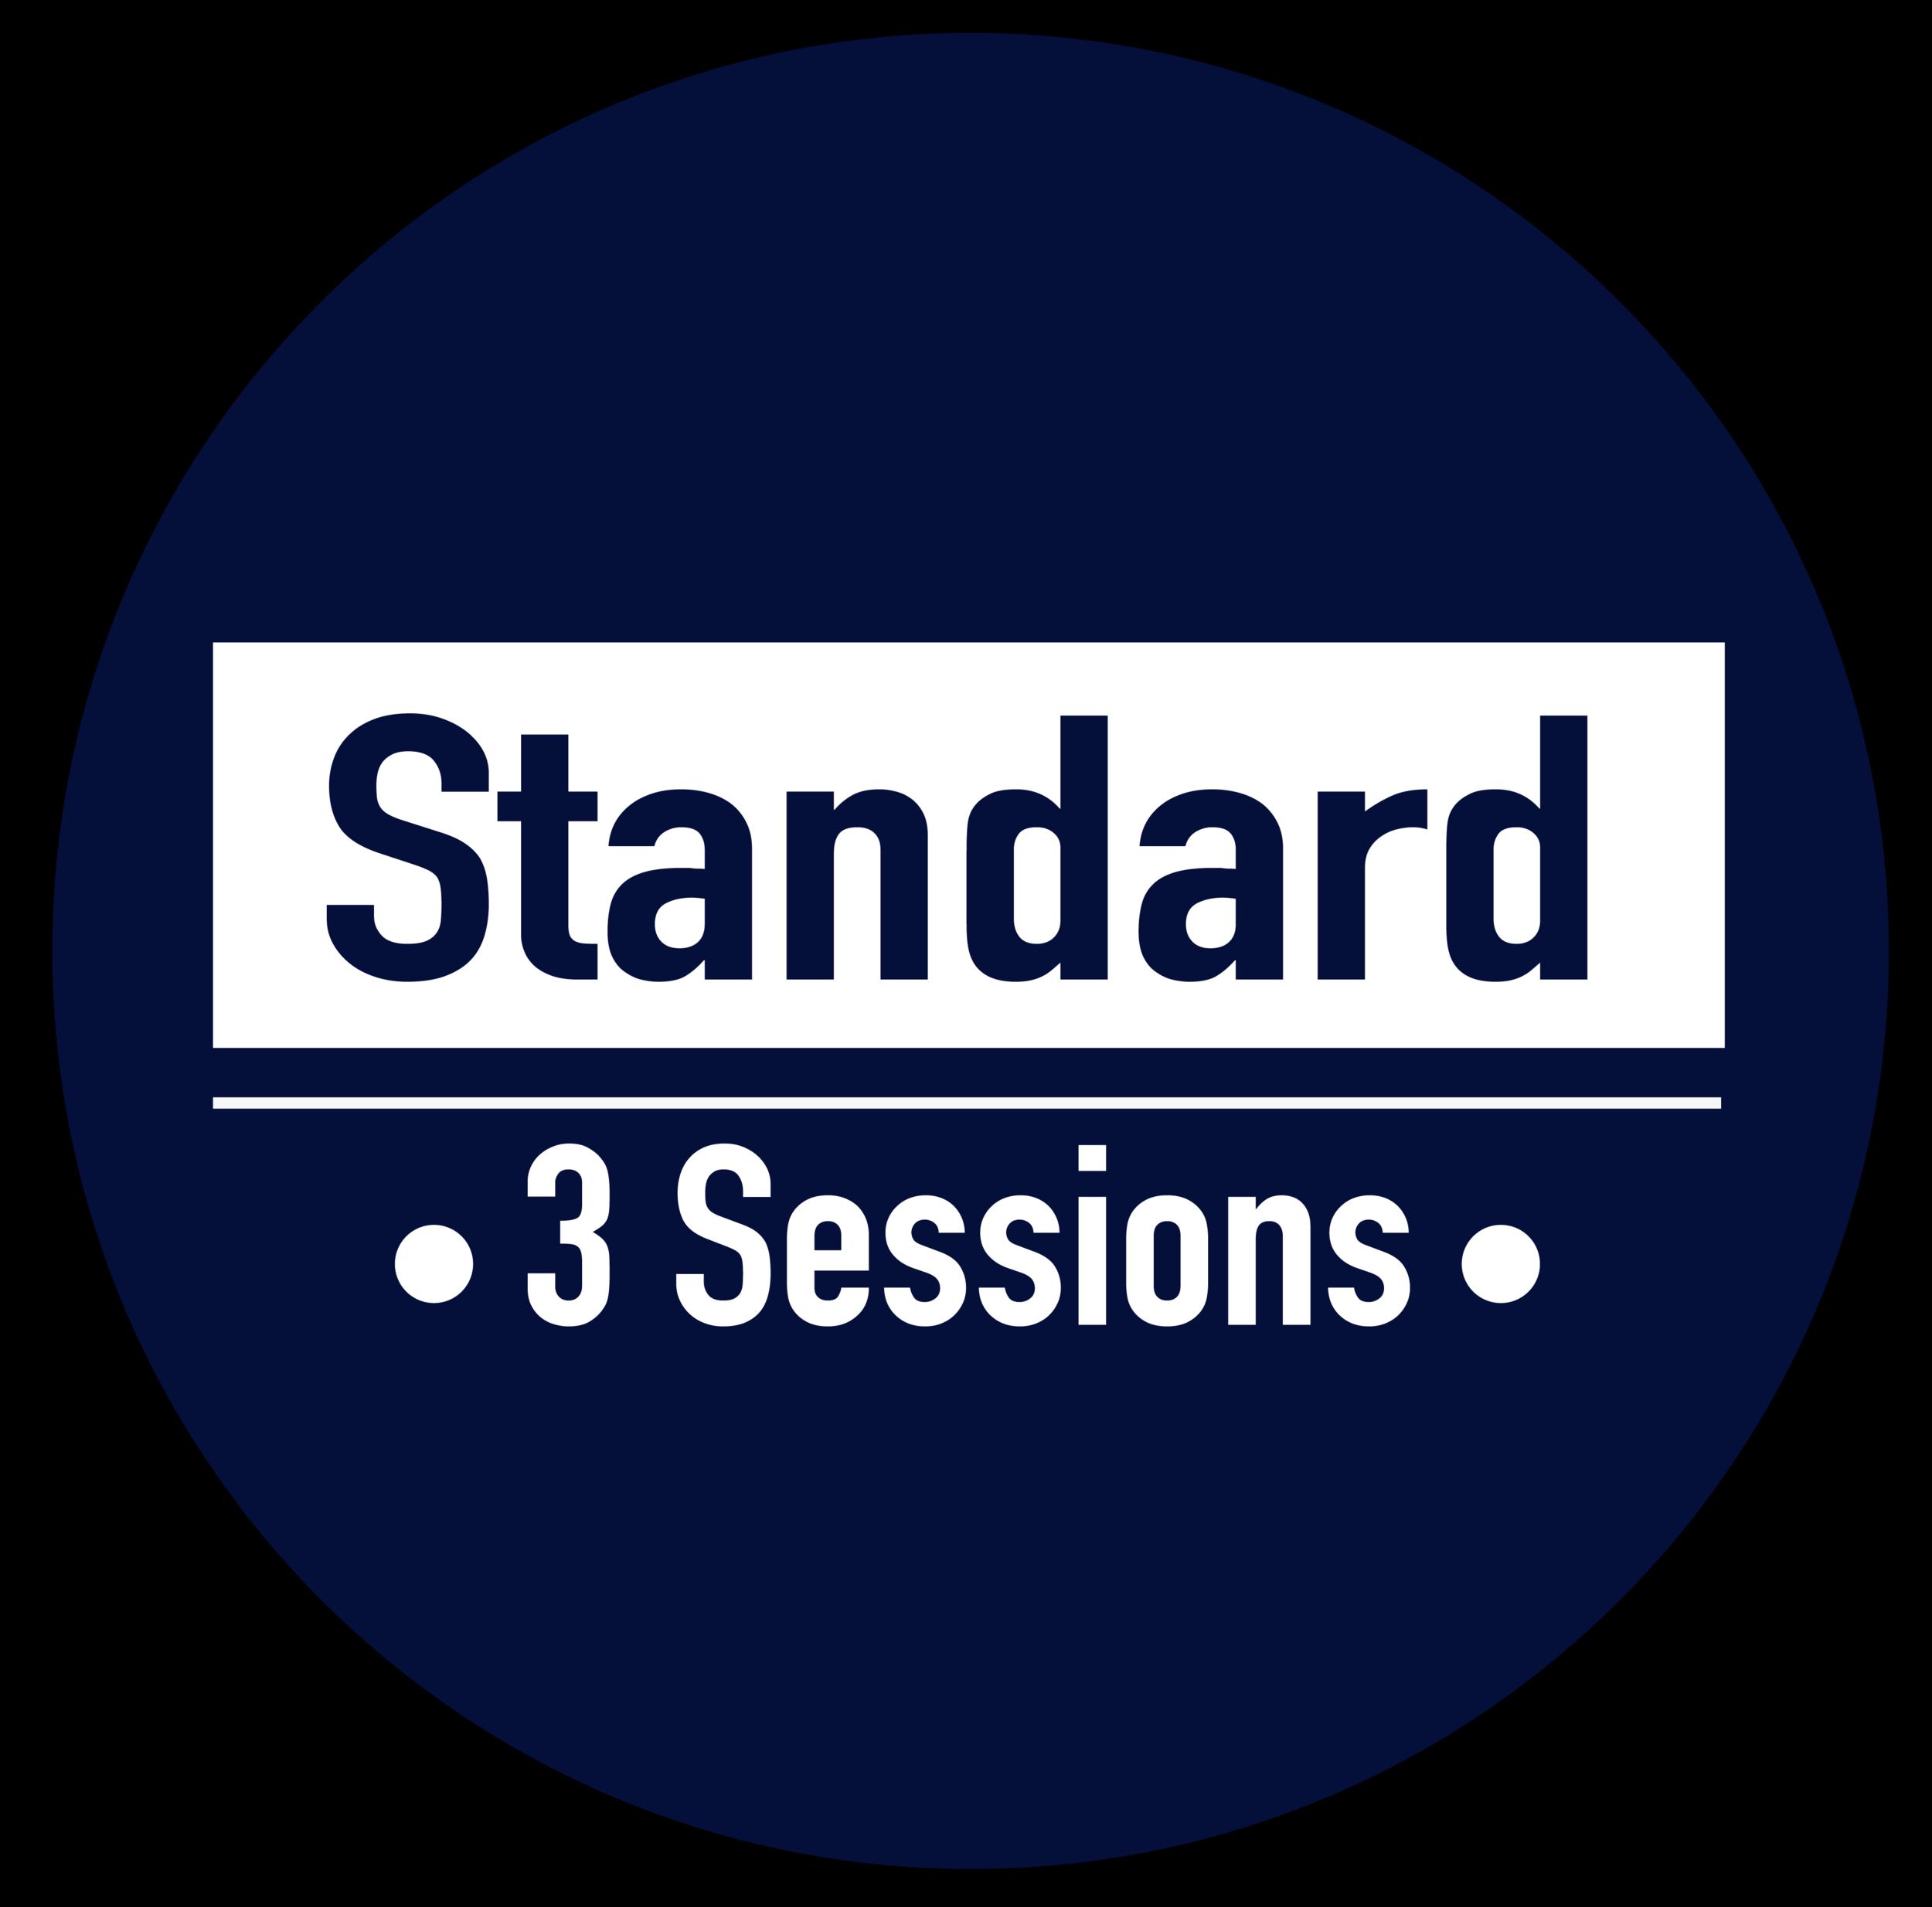 Standardfinal1nwq-02.png